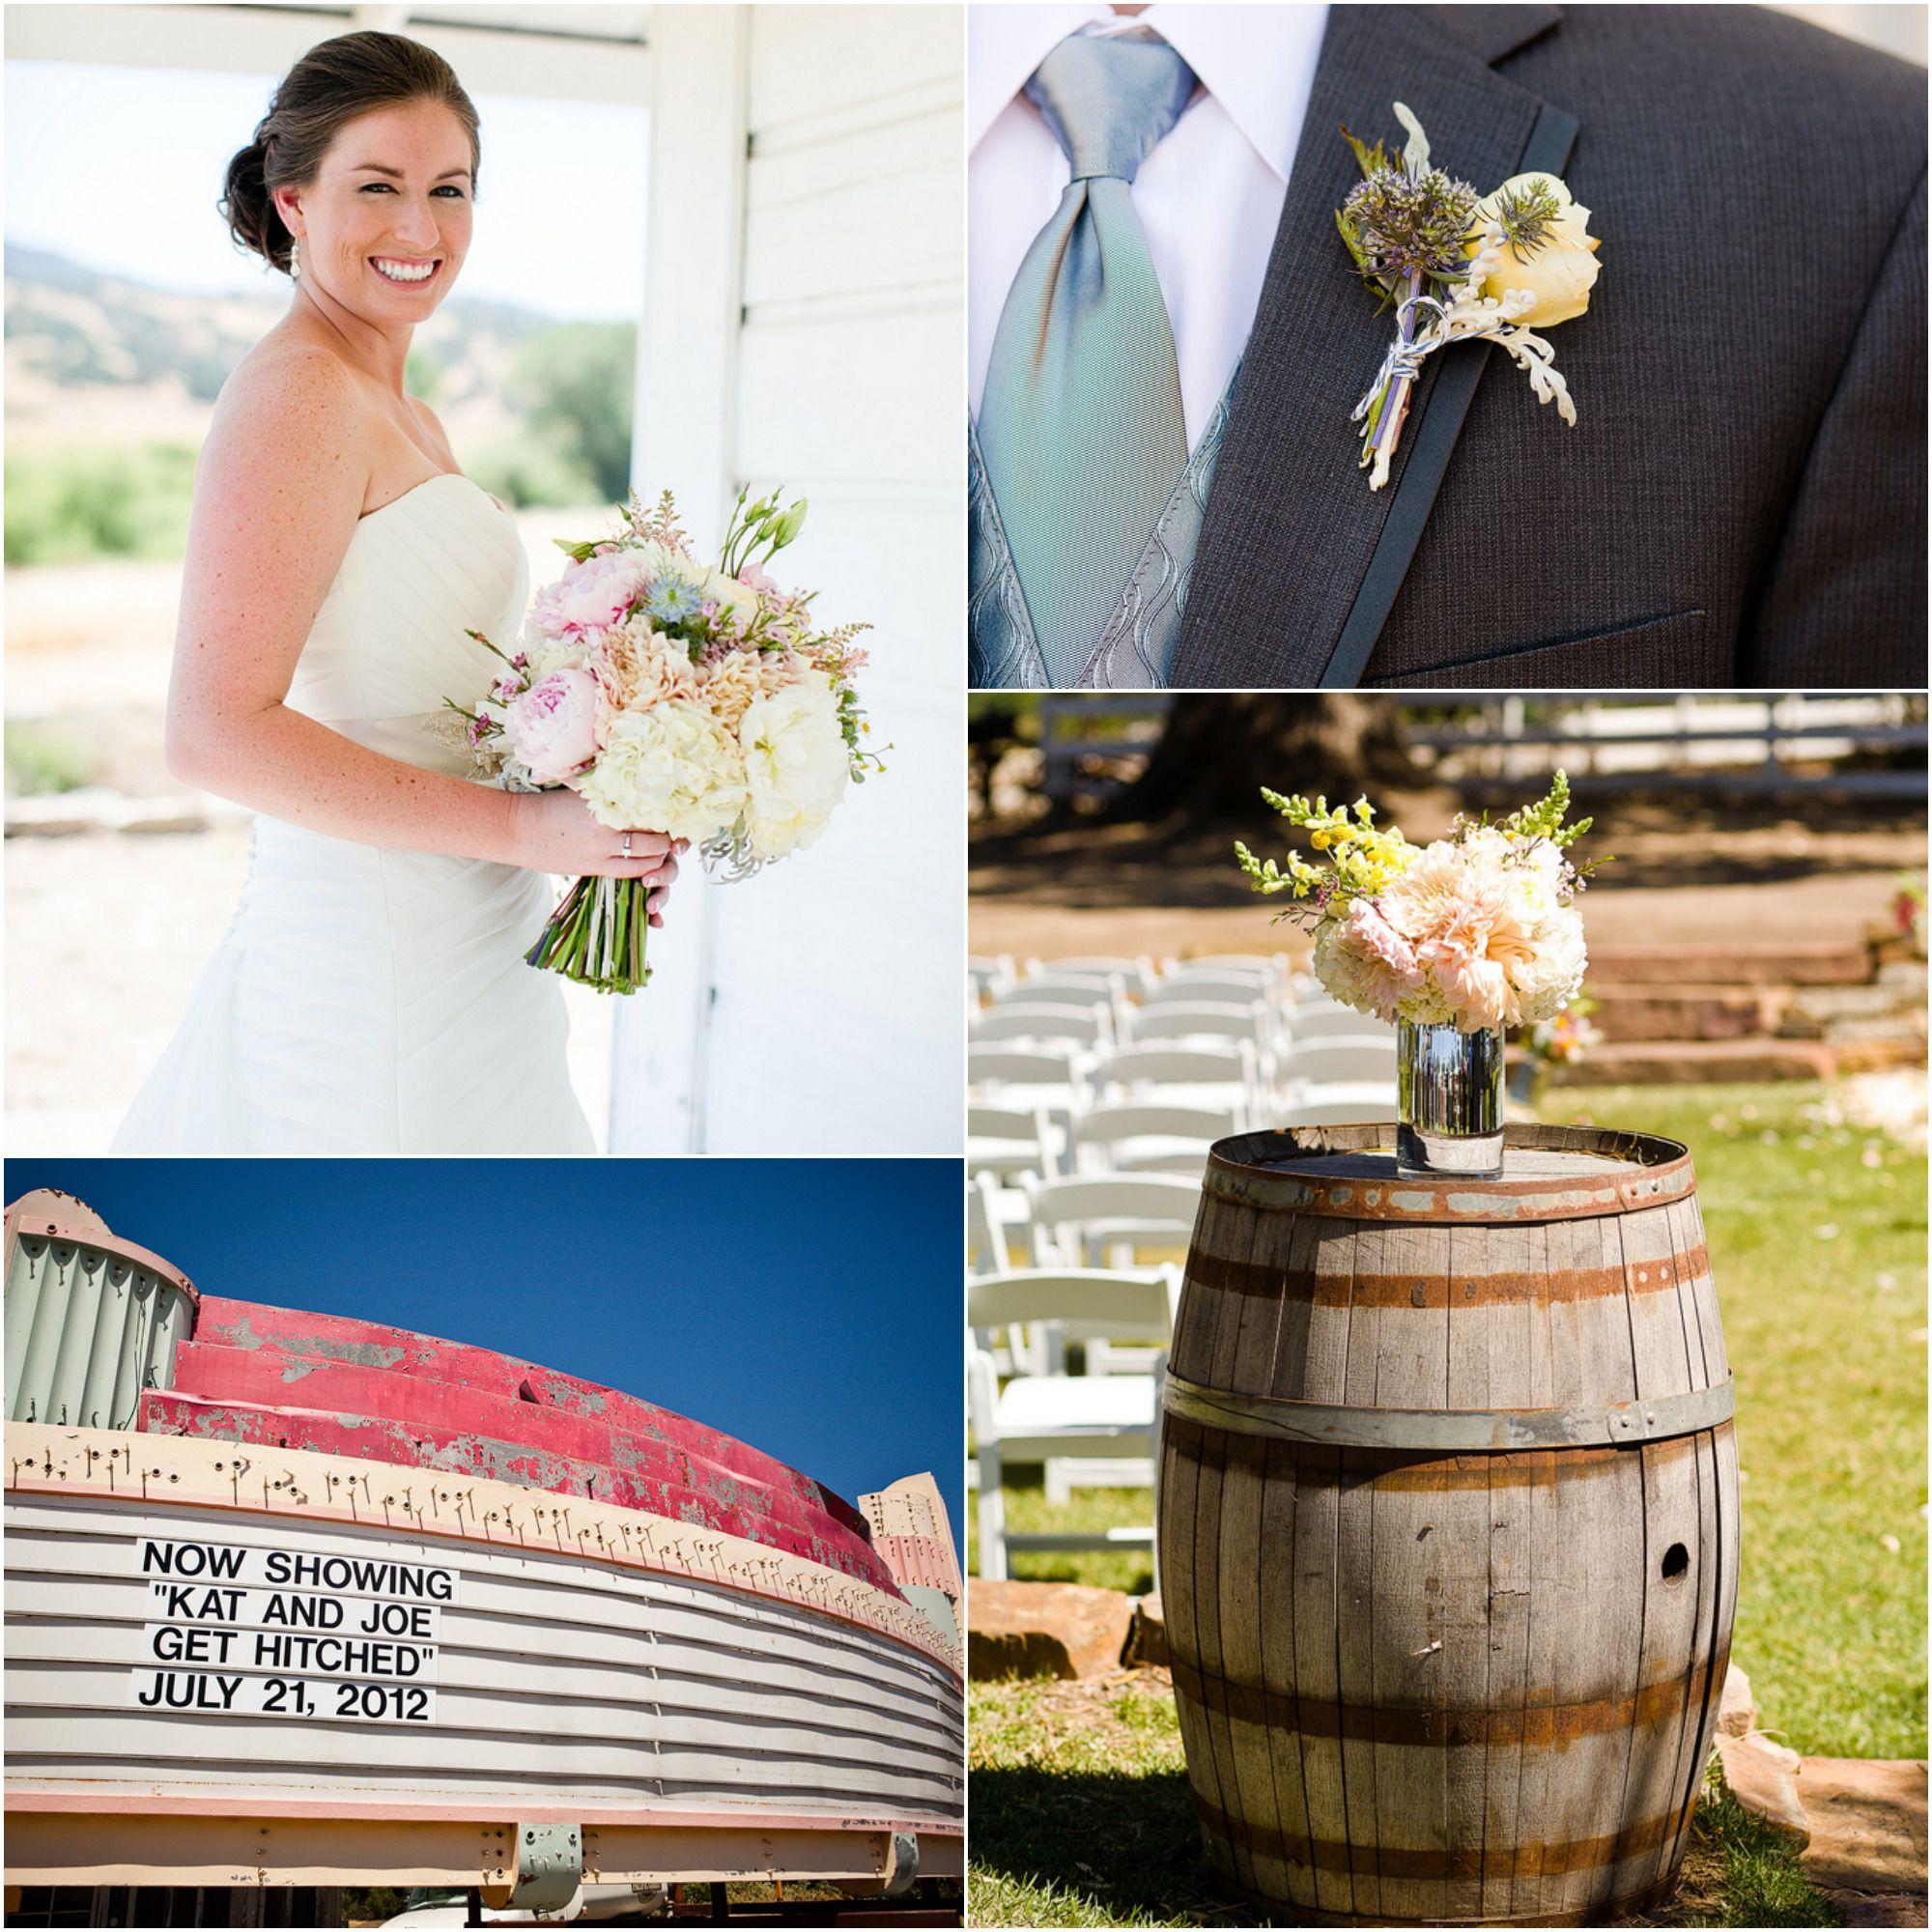 California Rustic Ranch Wedding: Santa Margarita Rustic California Wedding